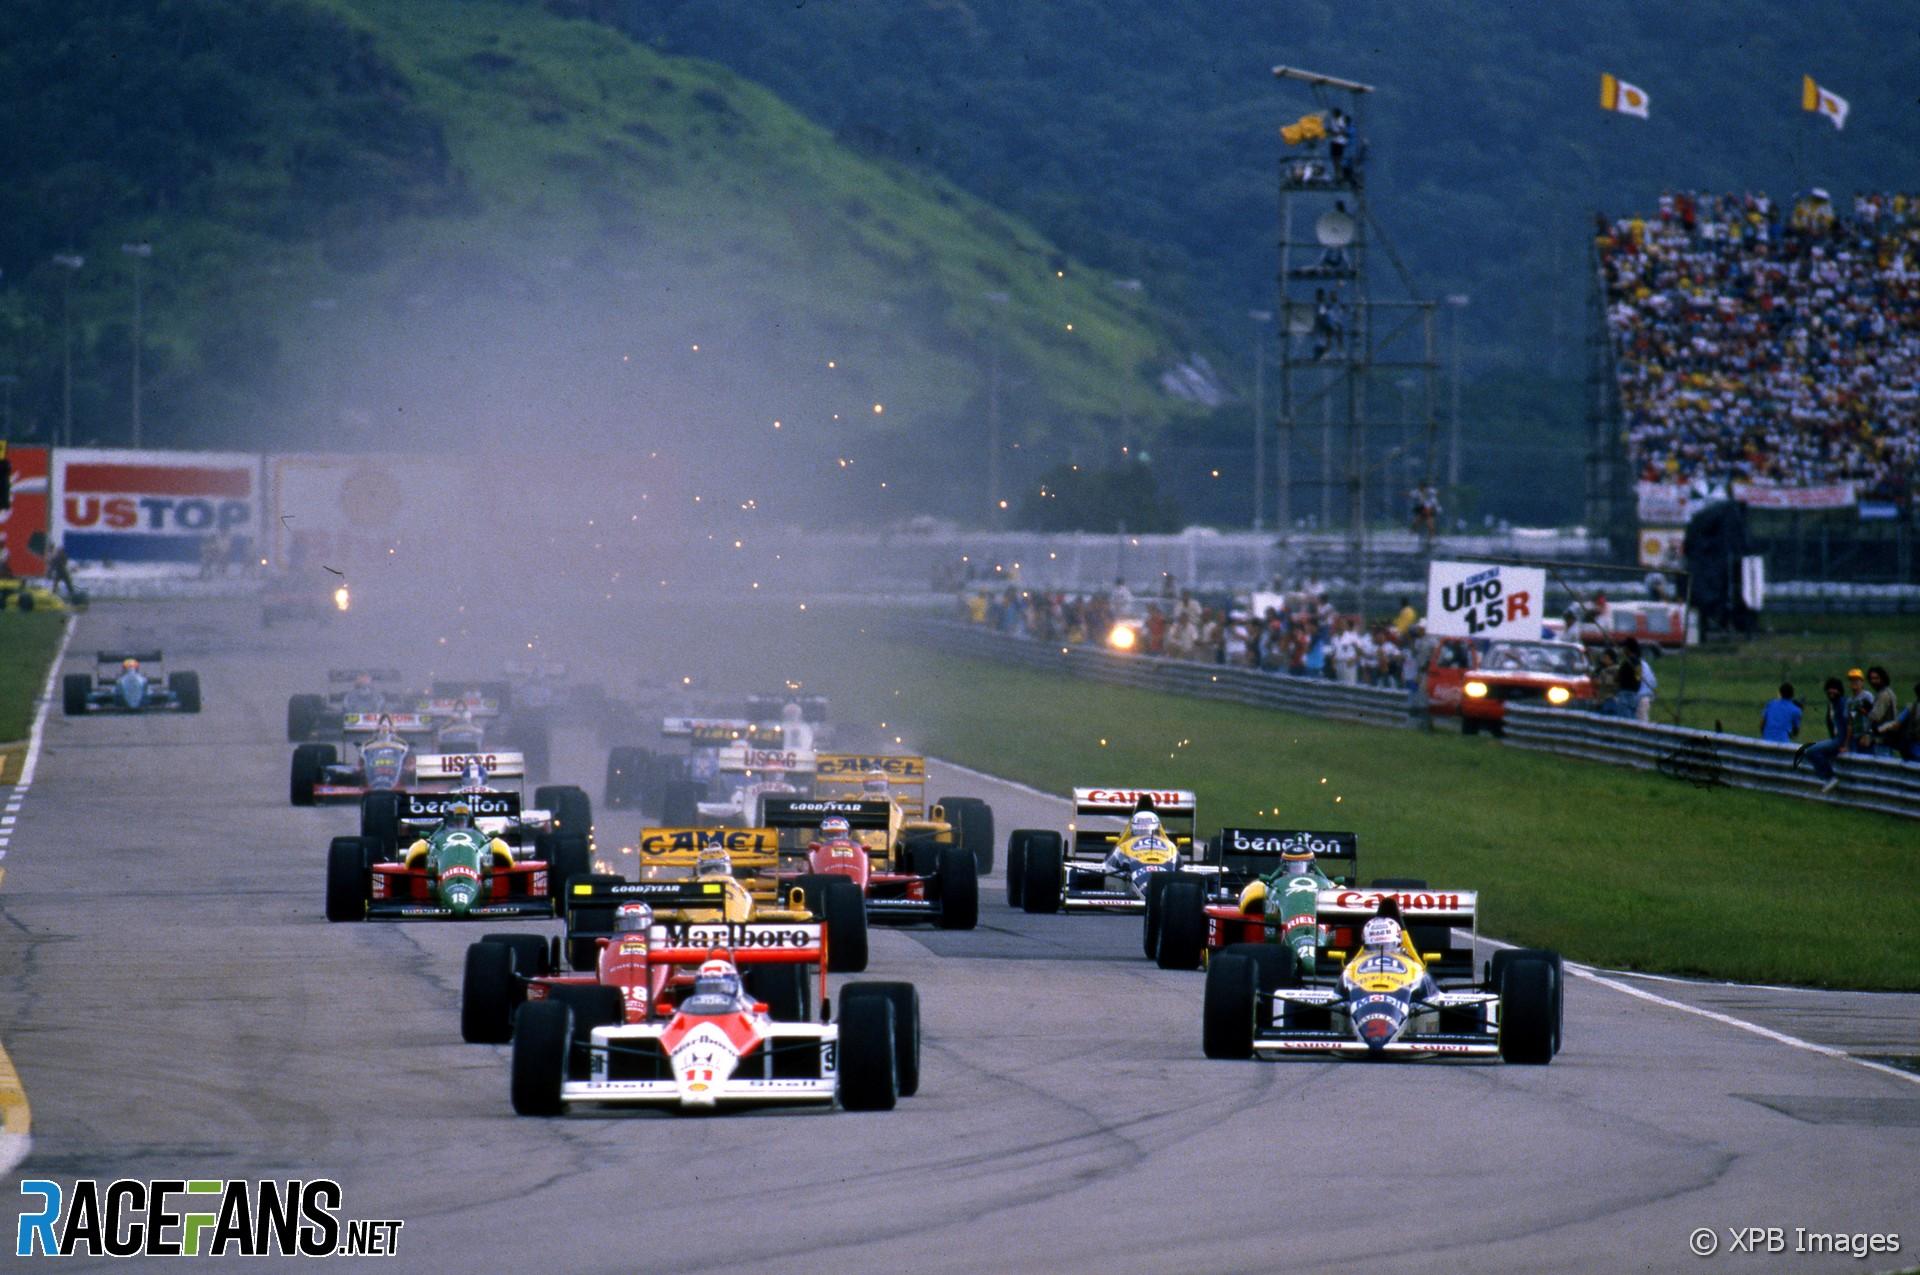 Start, Brazilian Grand Prix, Jacarepagua, 1989